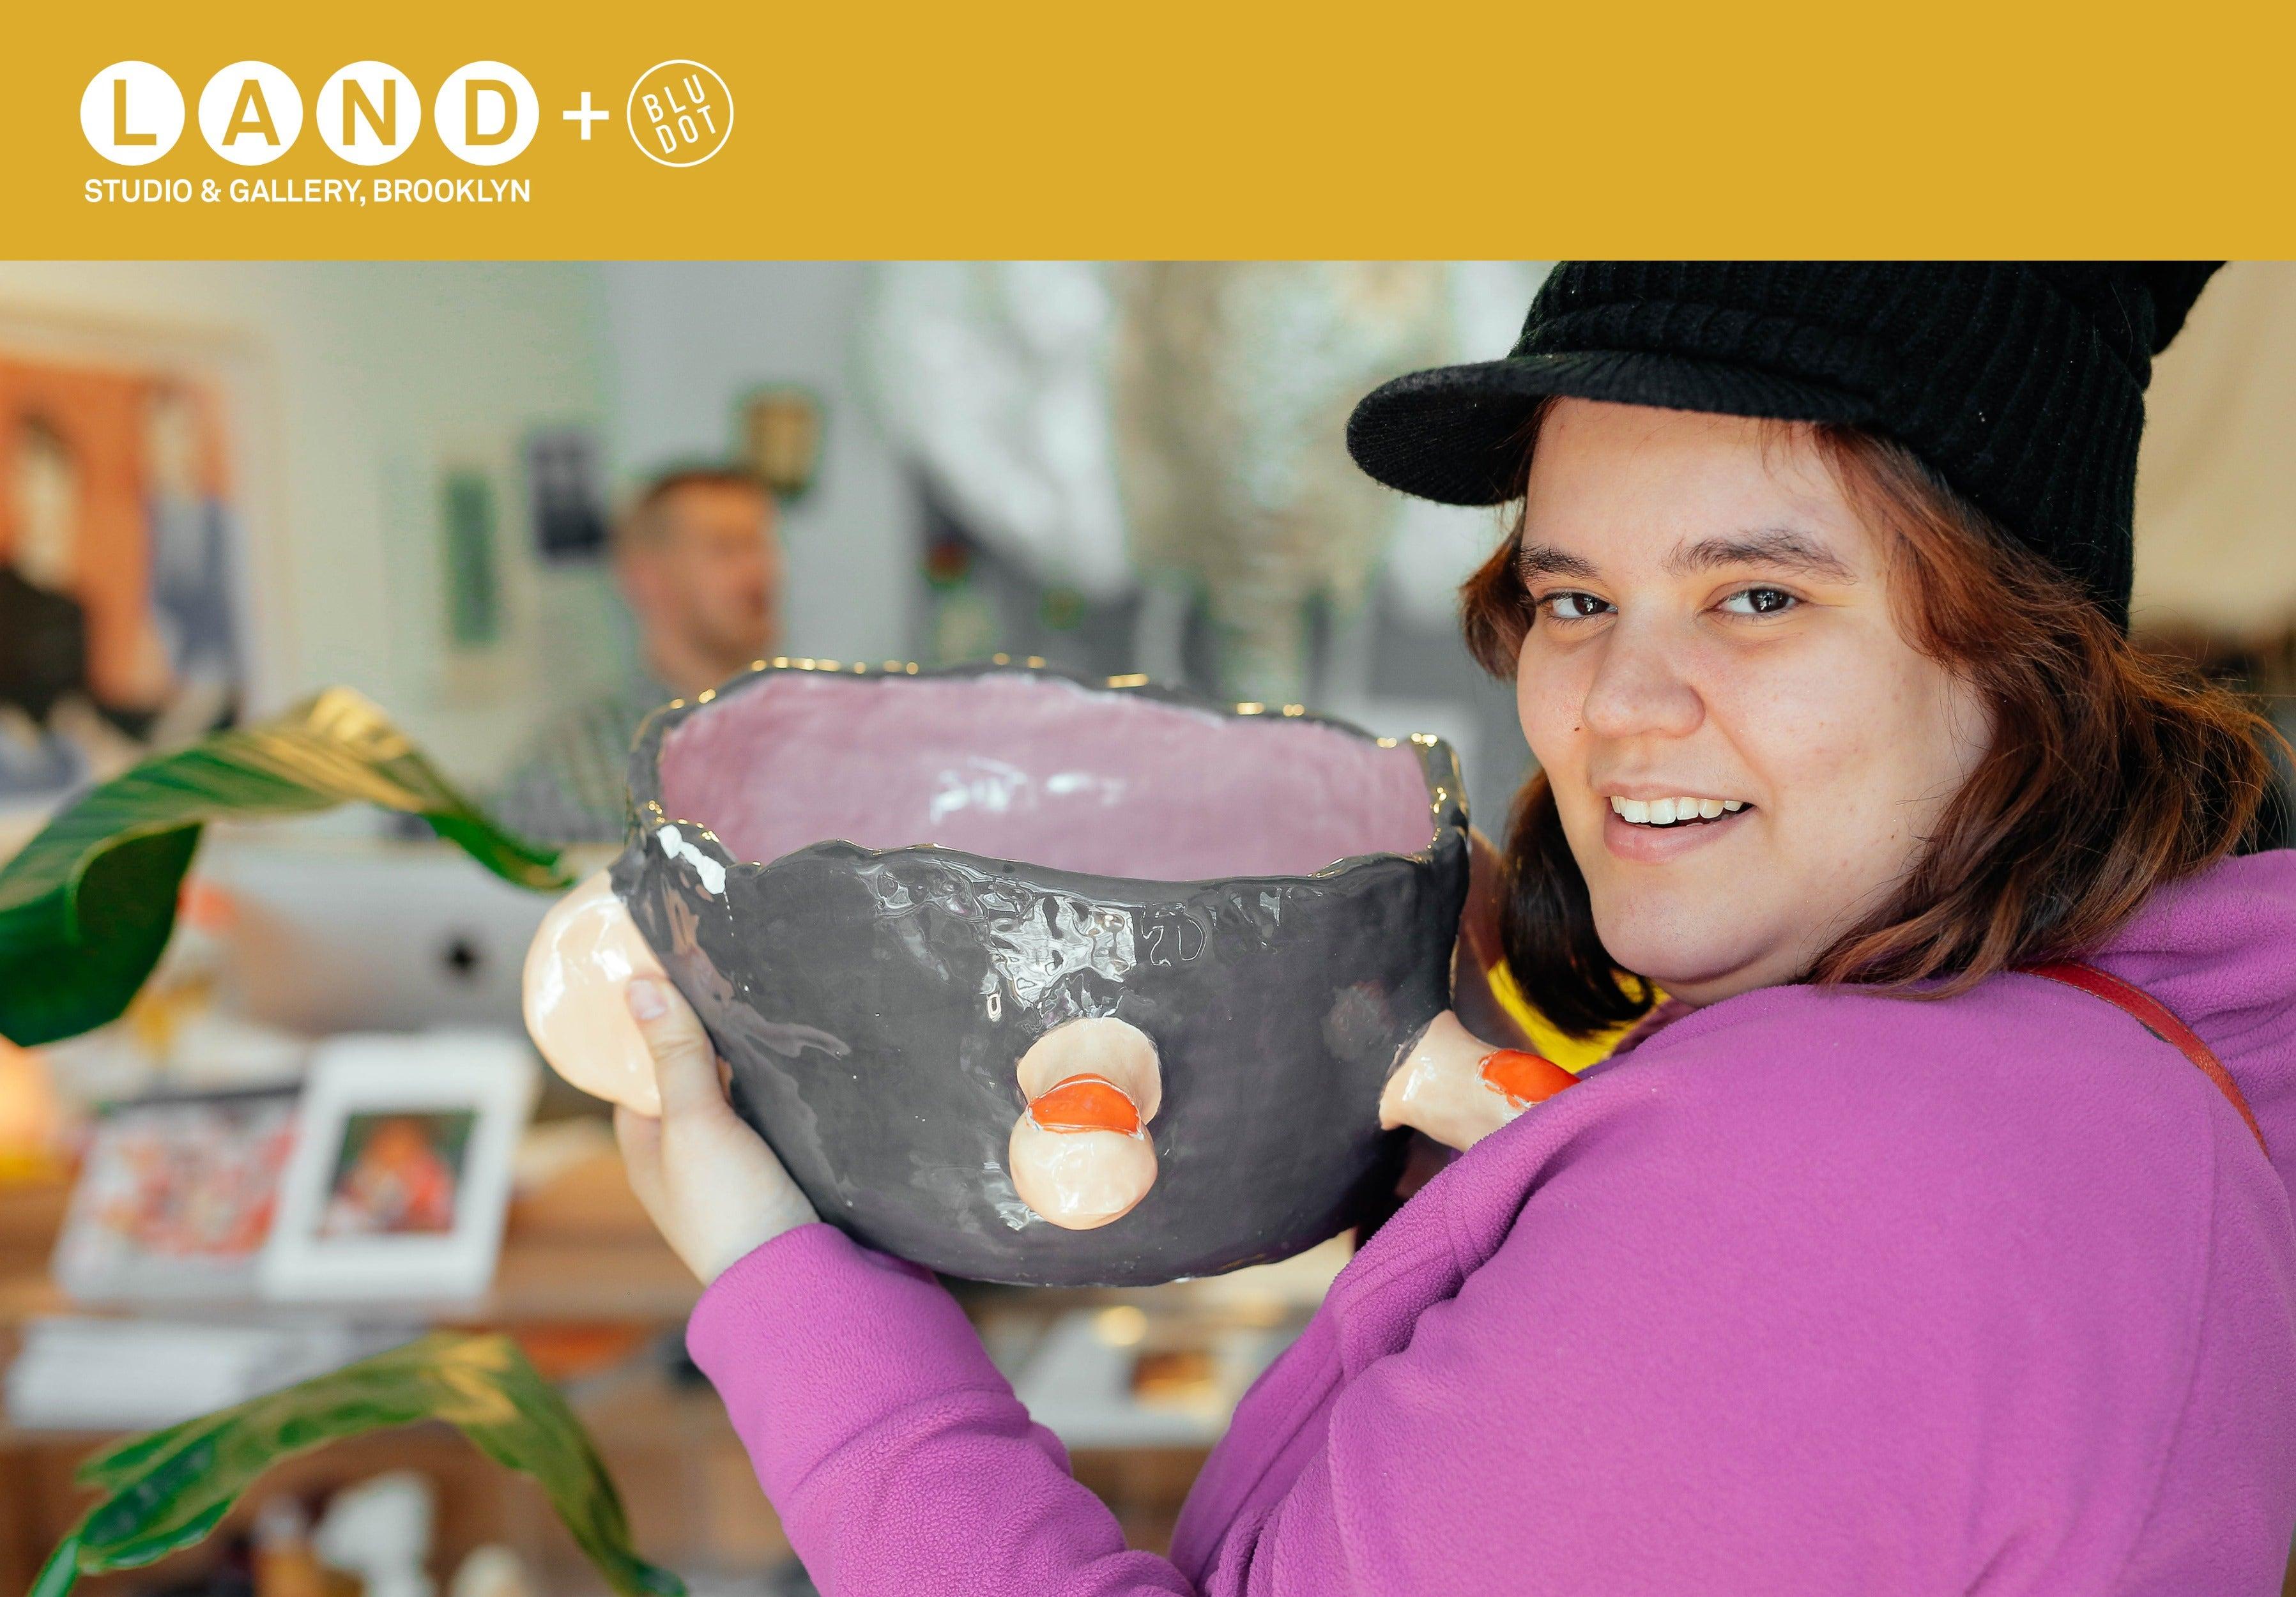 LAND Gallery + Blu Dot Meatball Vase